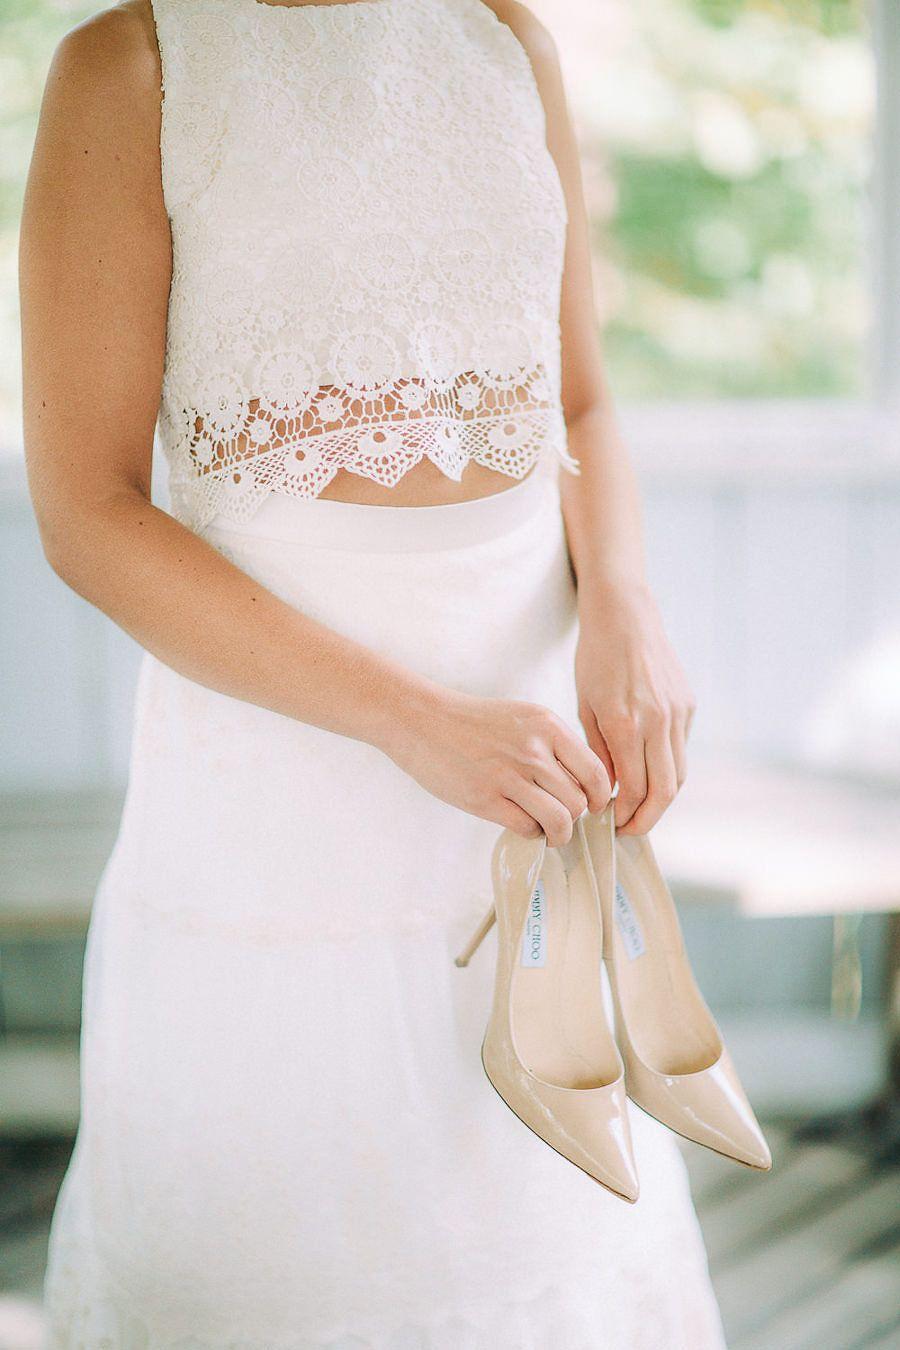 Wedding inspiration shoot in Finland.   Petra Veikkola Photography Wedding dress: Pukuni Styling: AINO / Satu & Pukuni / Saara Model: Wilma, Modelpoint Bride, boho, vintage, crop top, lace dress.